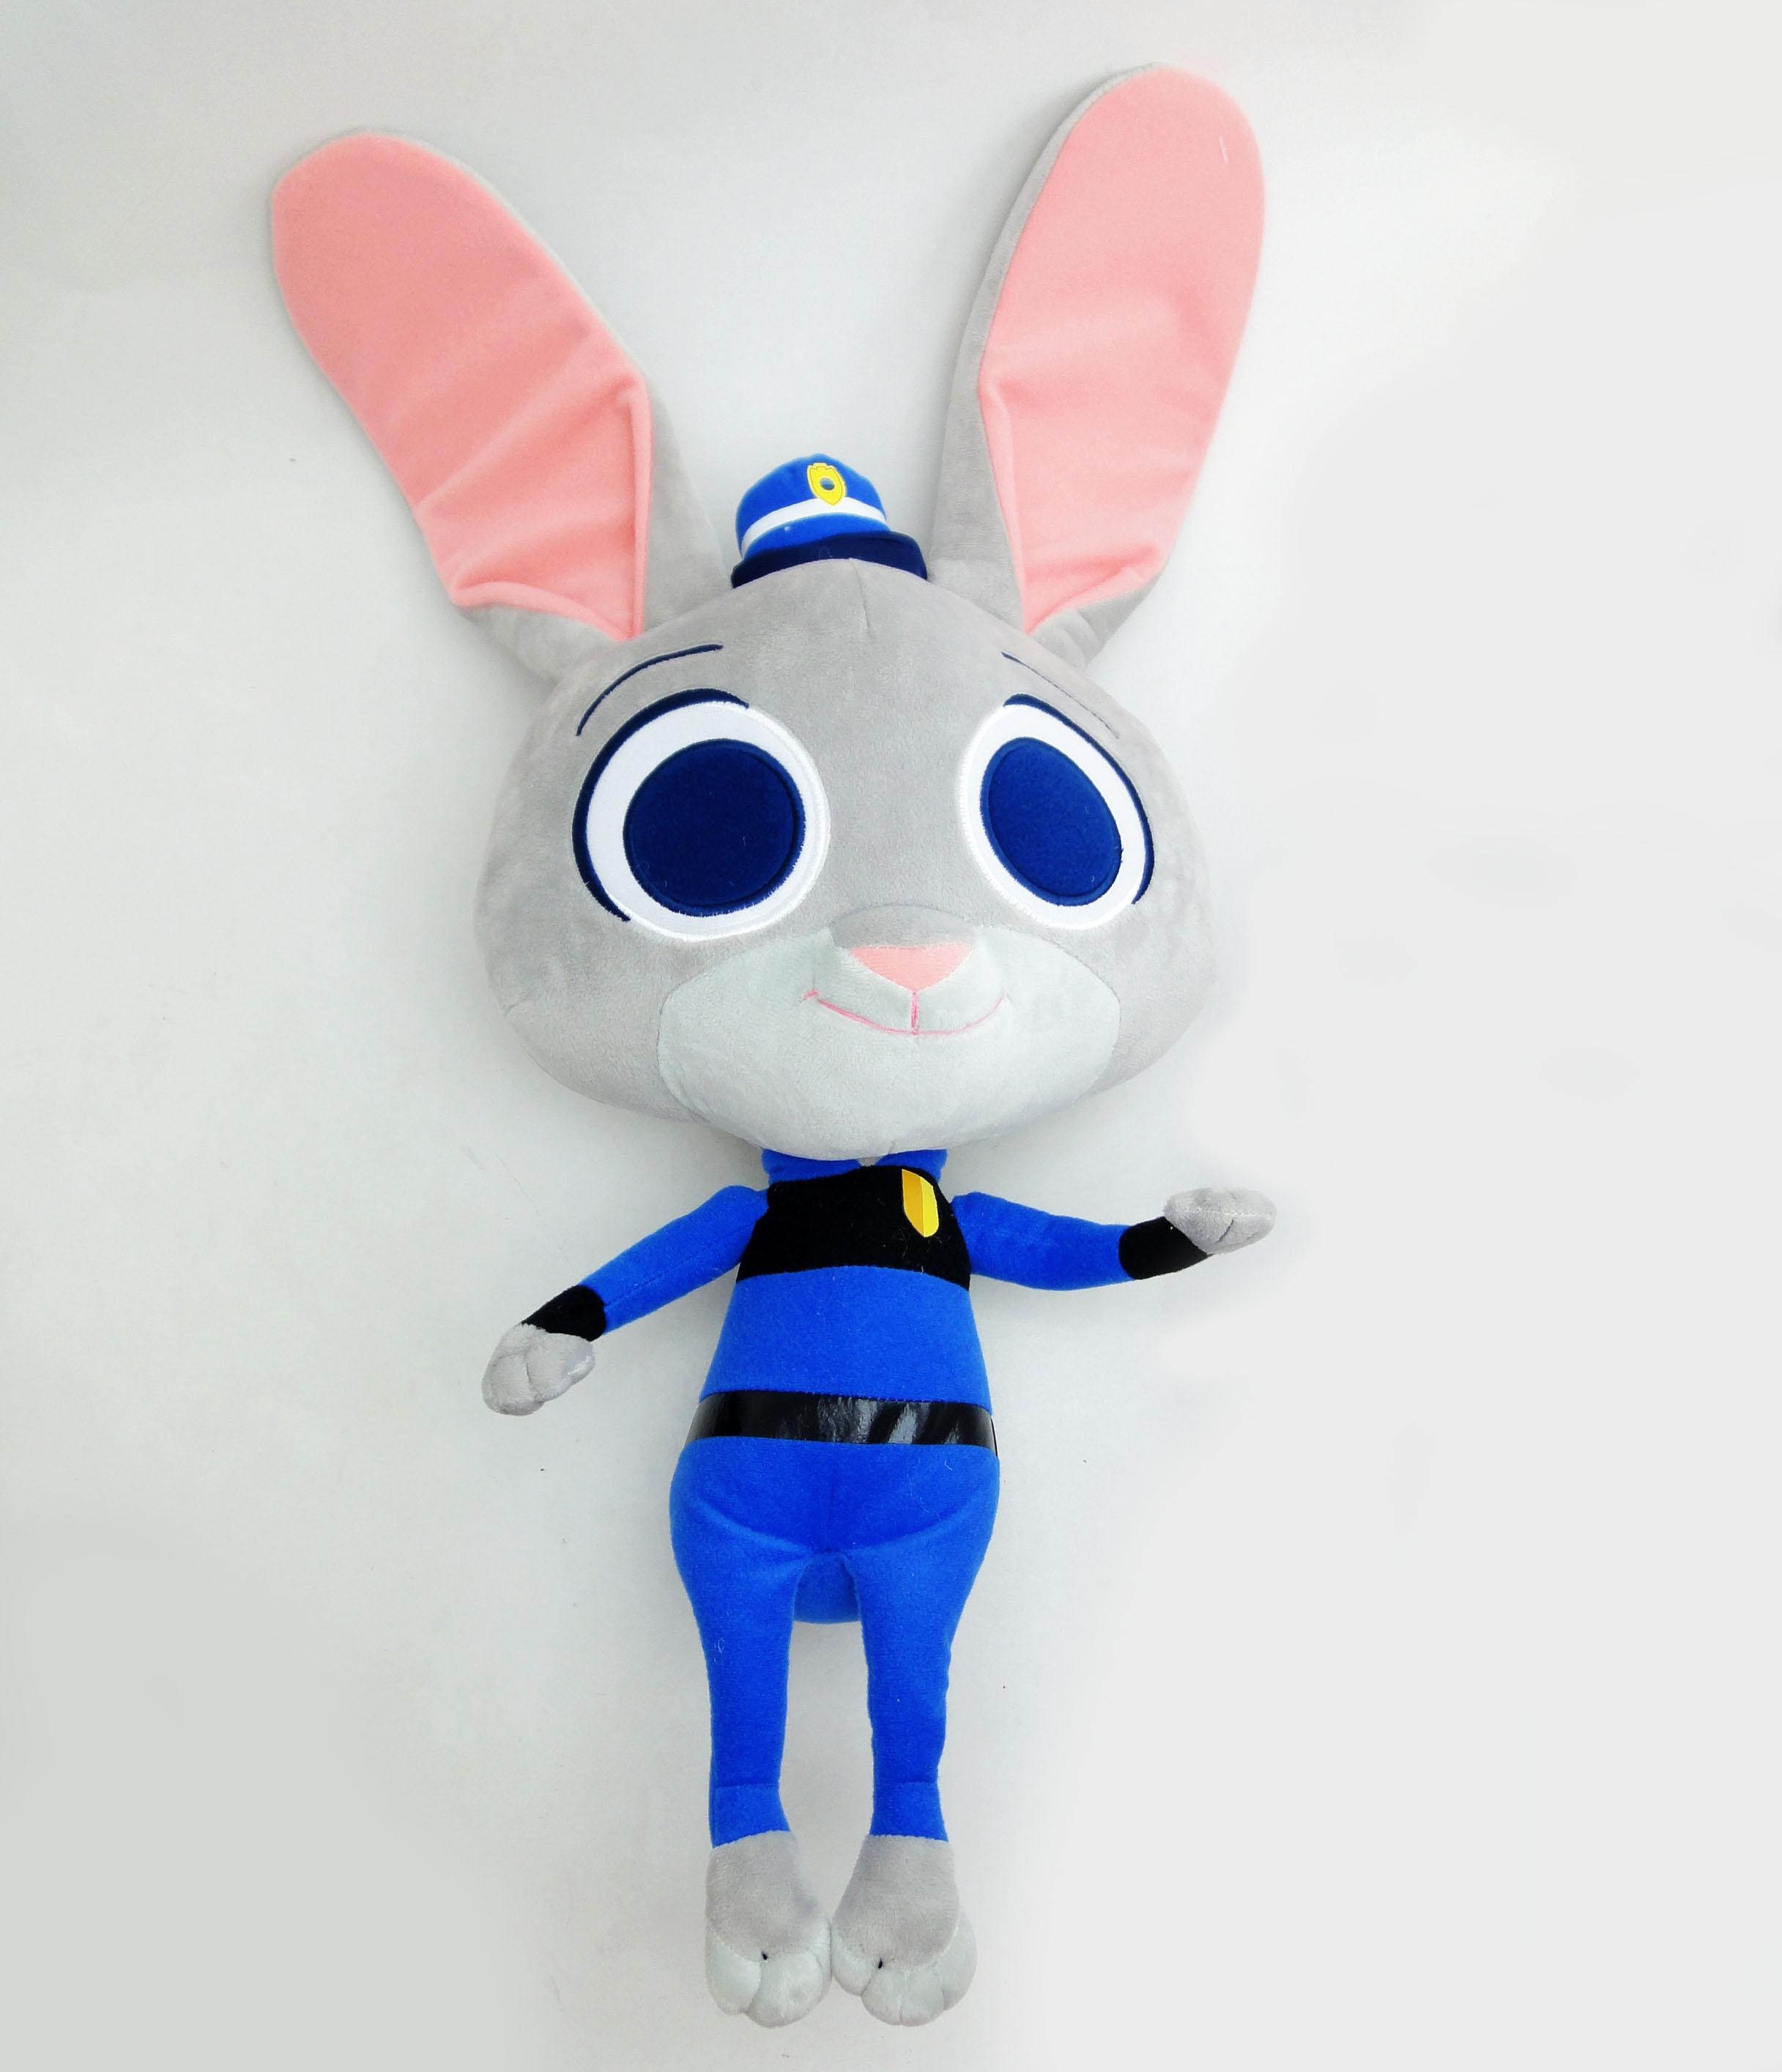 【UNIPRO】迪士尼 動物方城市 Zootopia 哈茱蒂 Judy Hopps Q版 兔子 警察 玩偶 60公分 絨毛娃娃